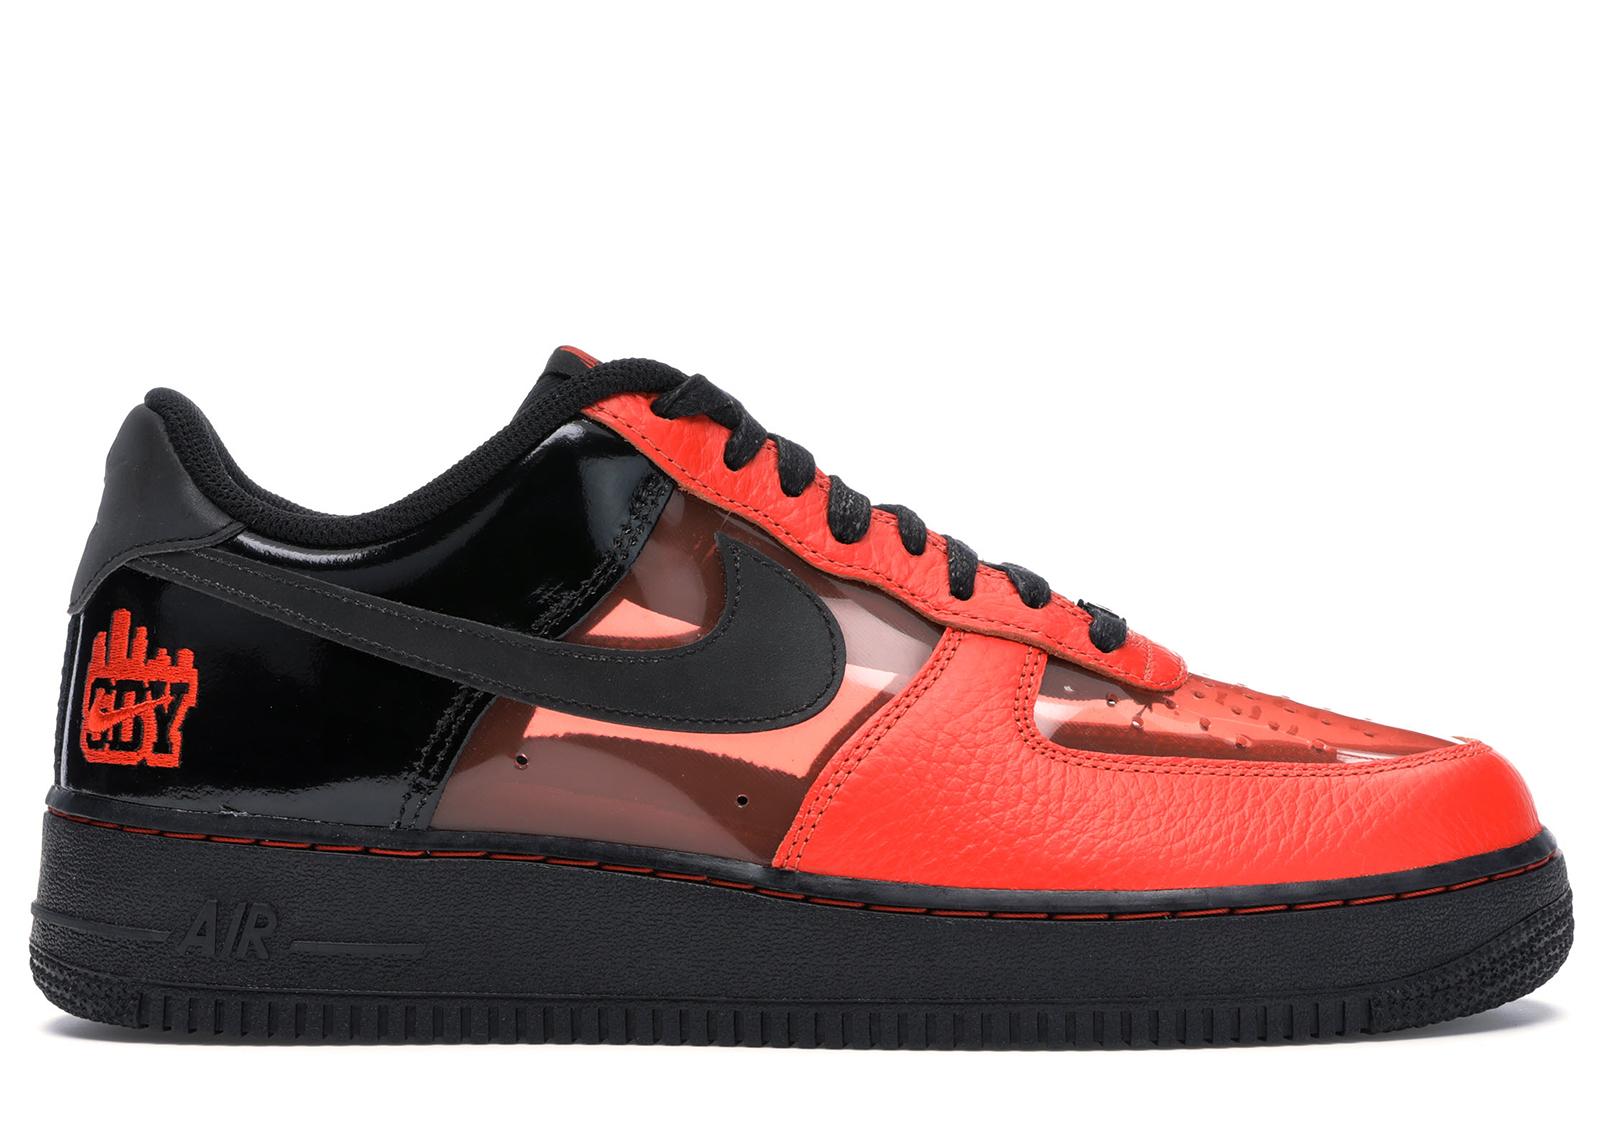 Nike Air Force 1 Low Shibuya Halloween - CT1251-006